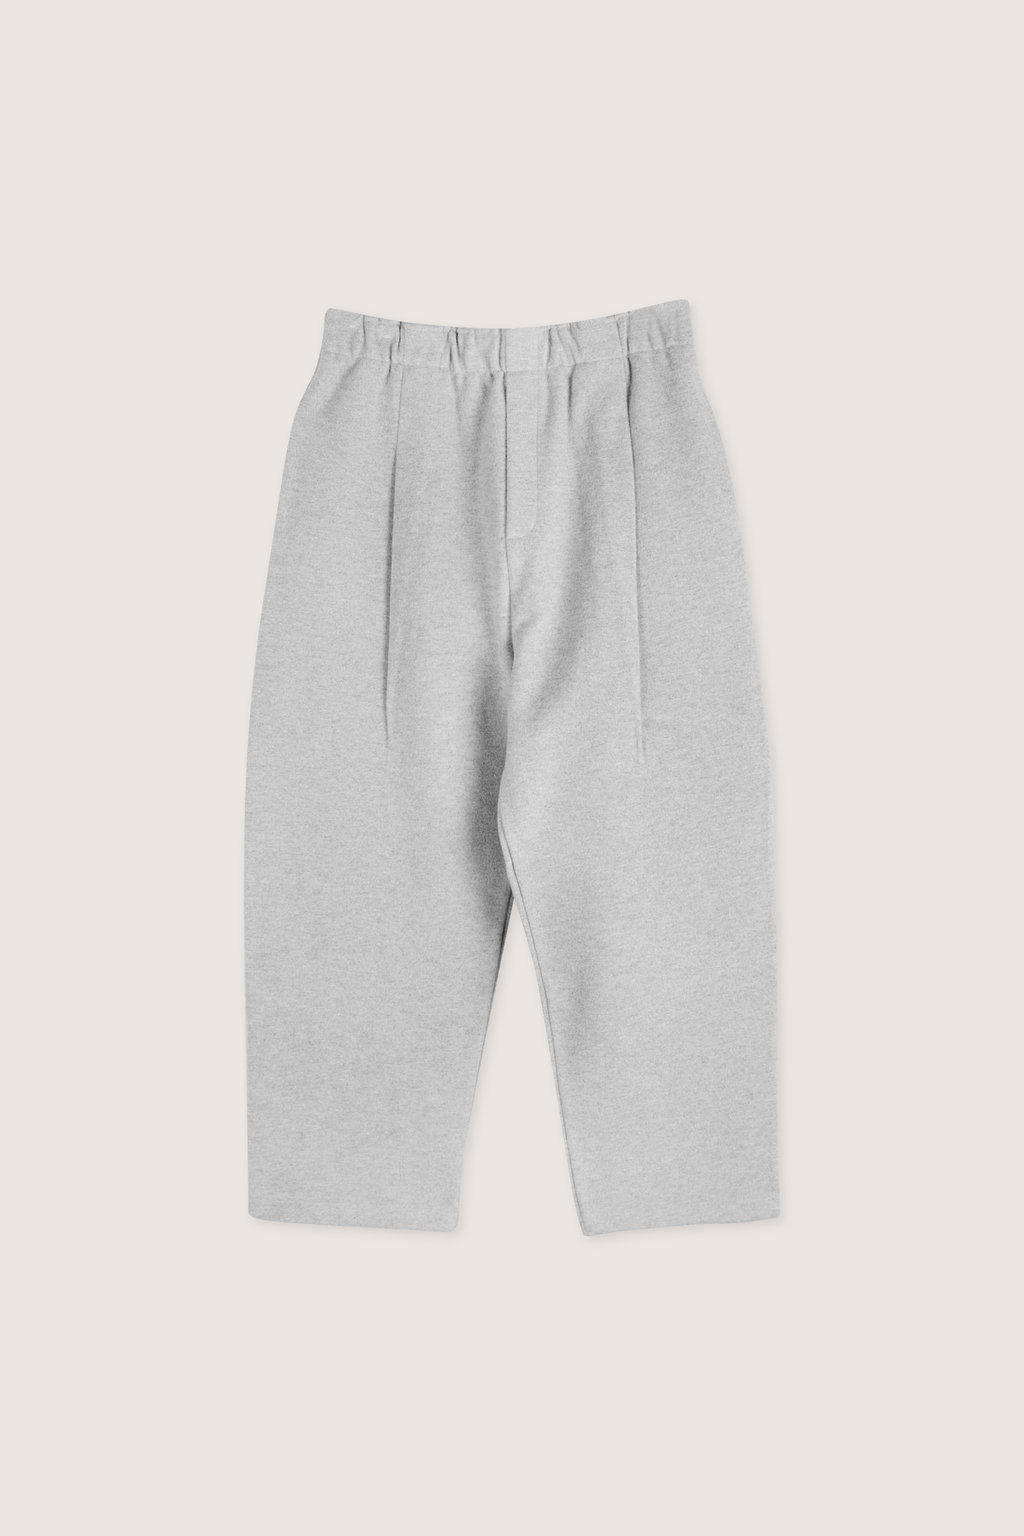 Pant 1676 Gray 7